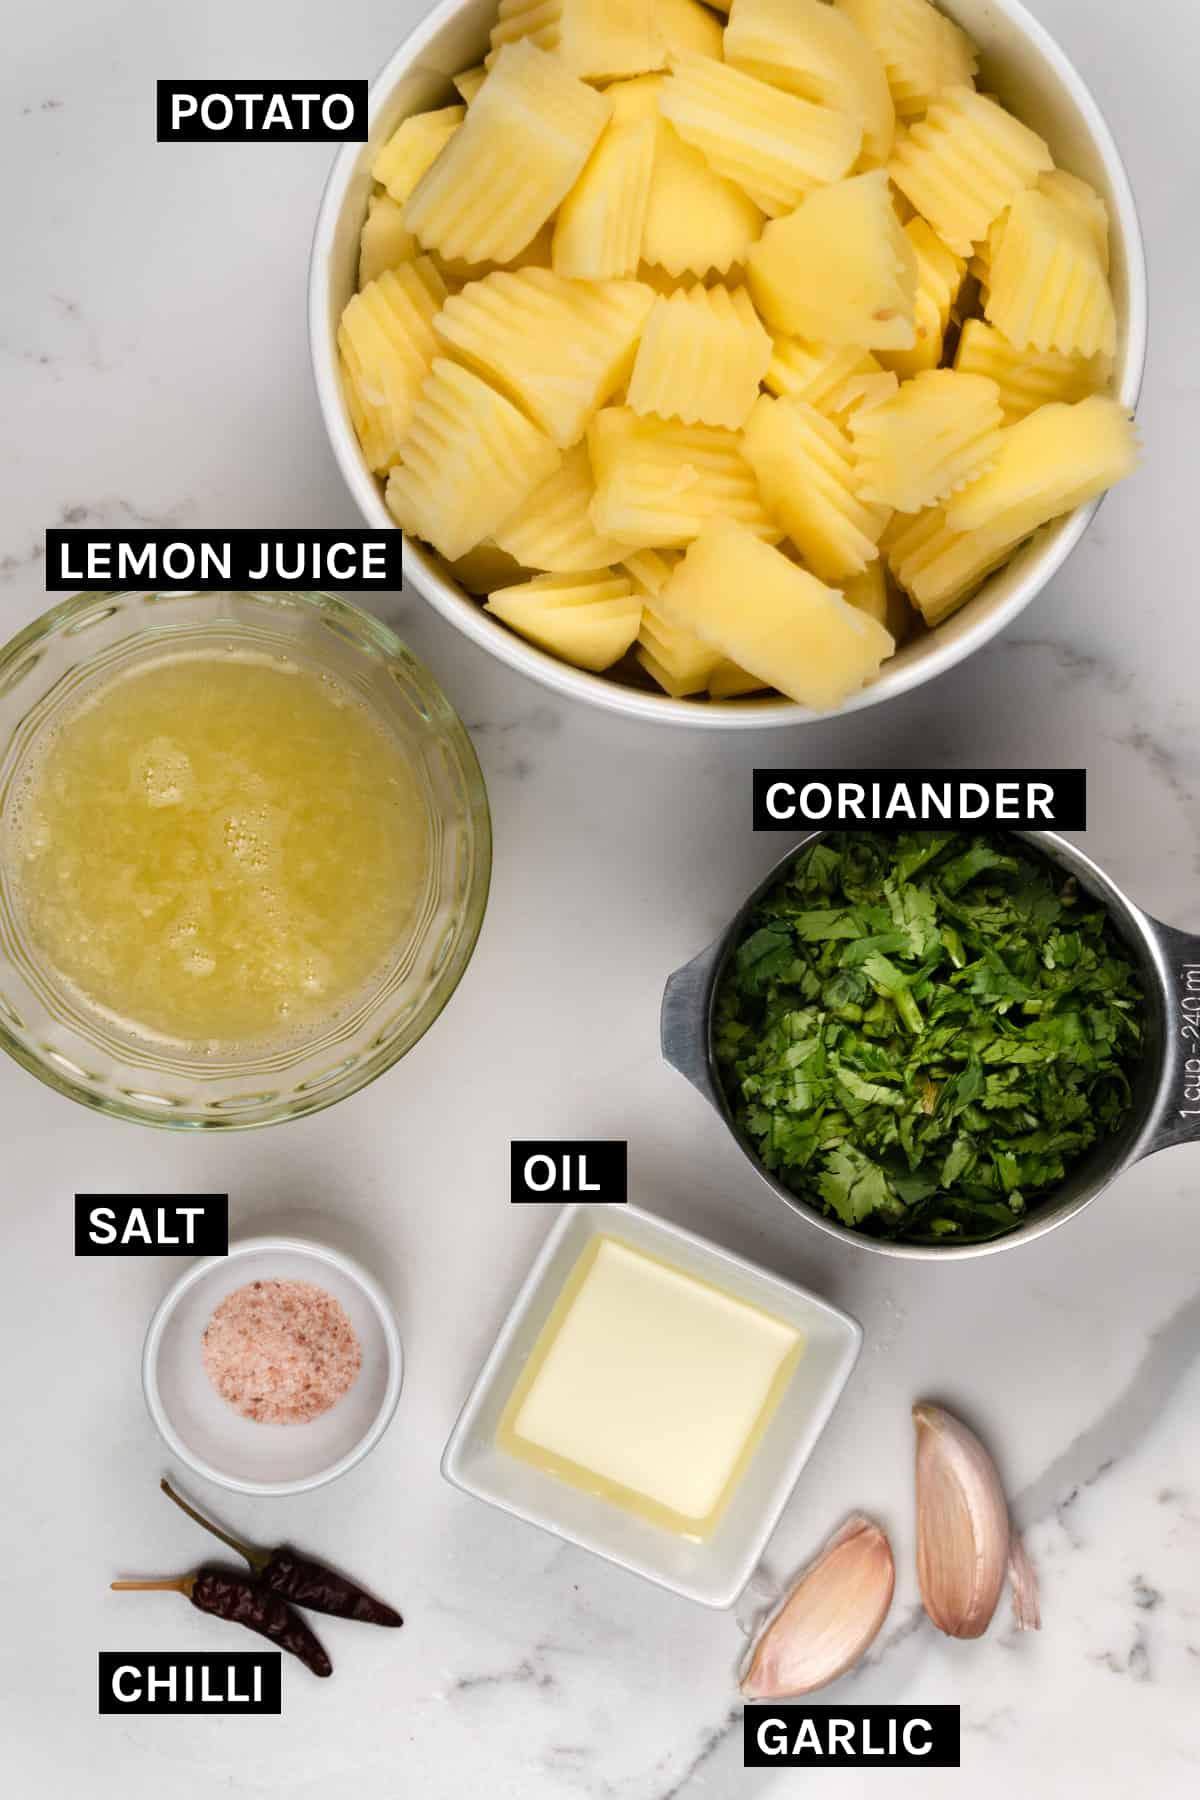 Batata harra ingredients laid out